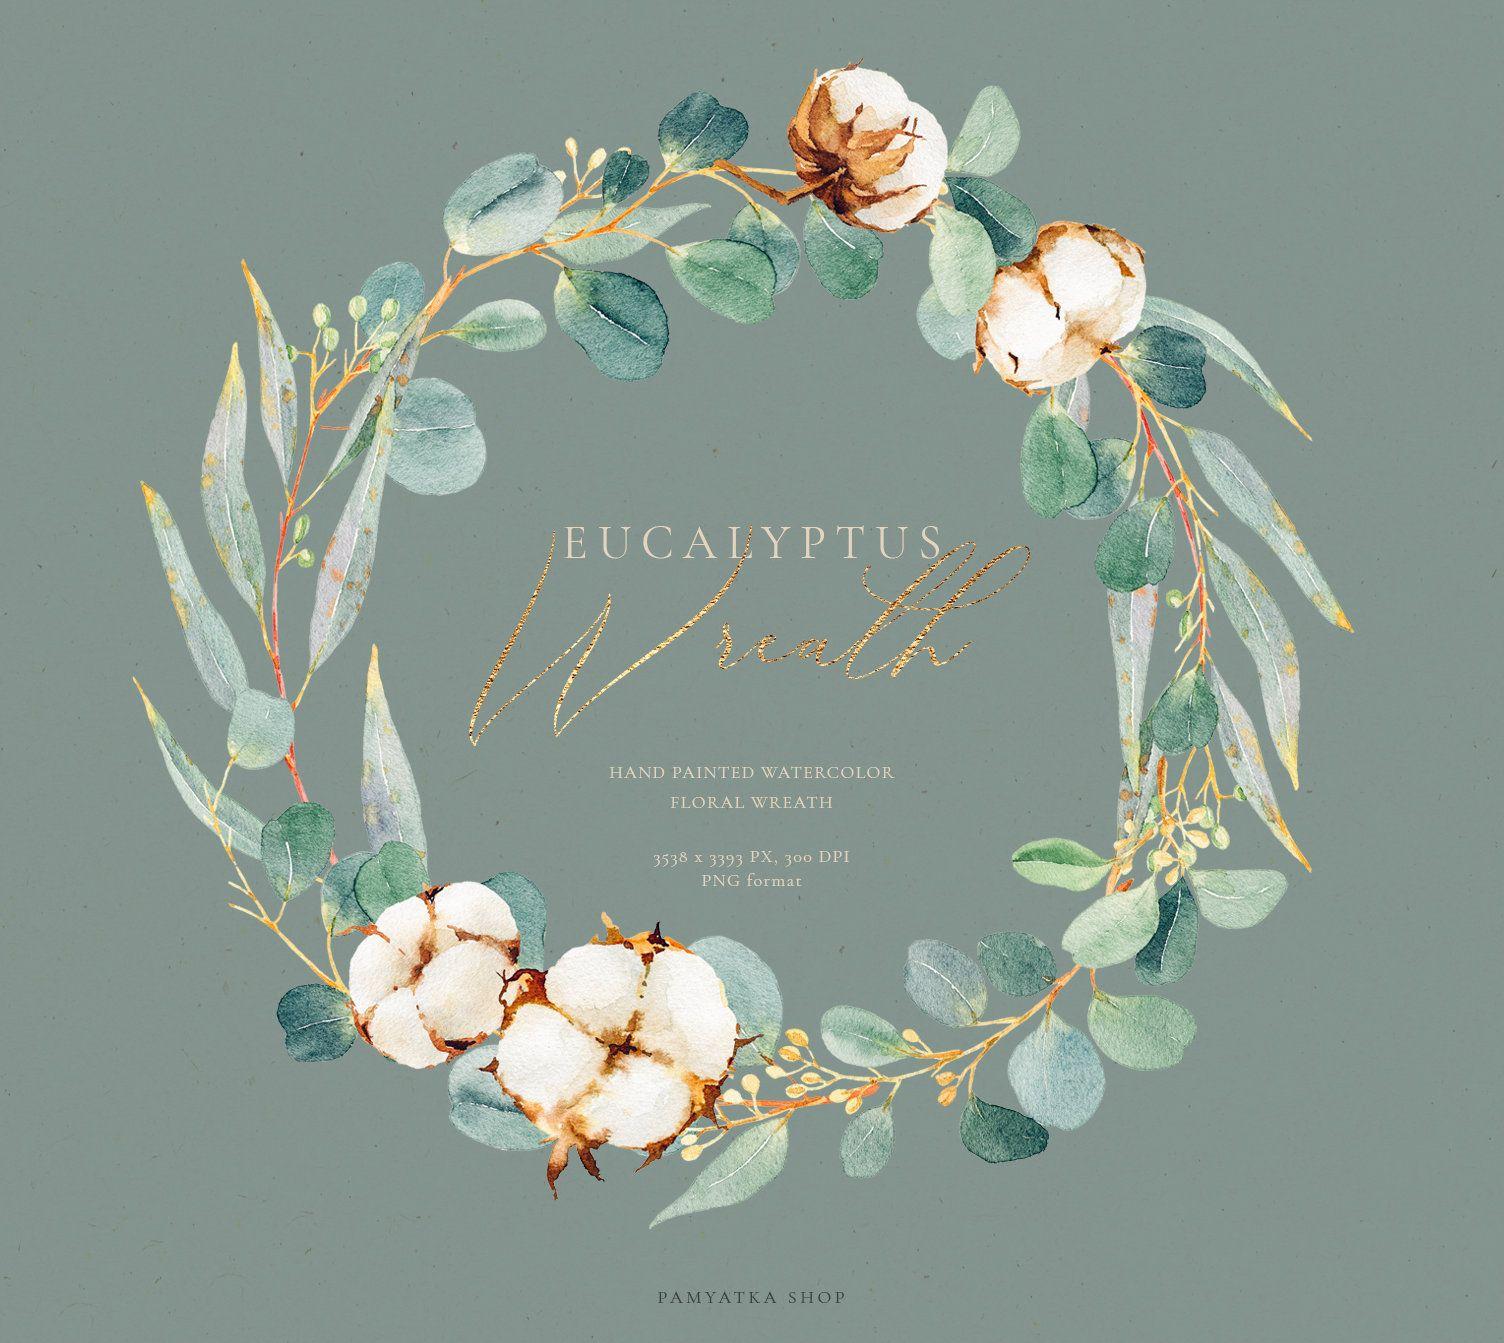 Photo of Eucalyptus wreath clipart, watercolor wreath, eucalyptus & watercolor cotton, wedding clipart, cotton wreath, greenery frame foliage clipart